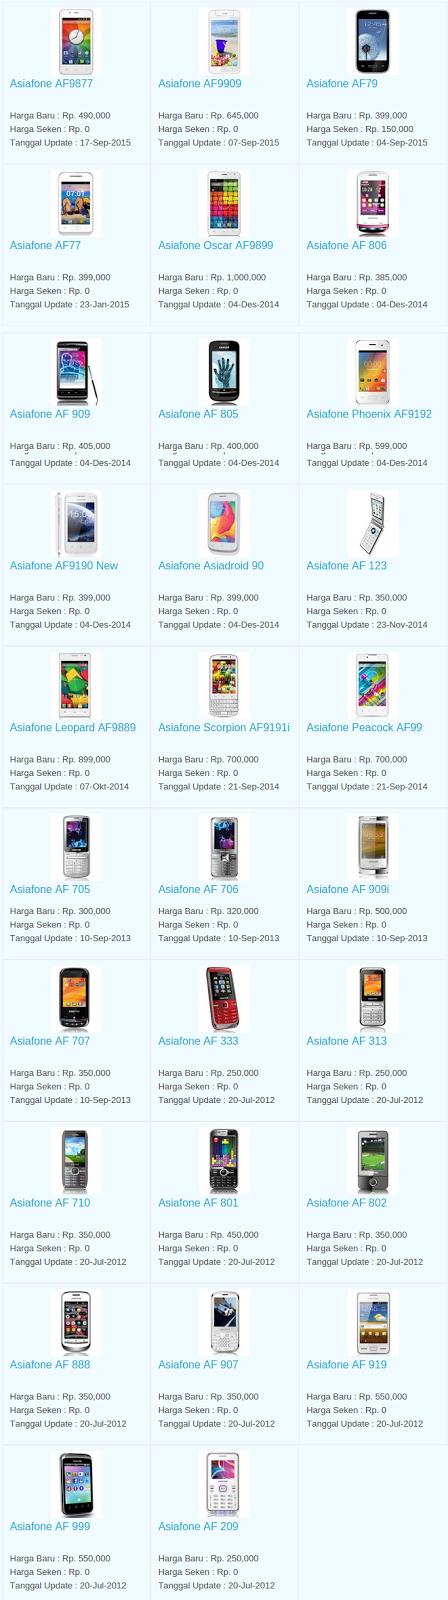 Daftar Harga Hp Asiafone Desember 2015